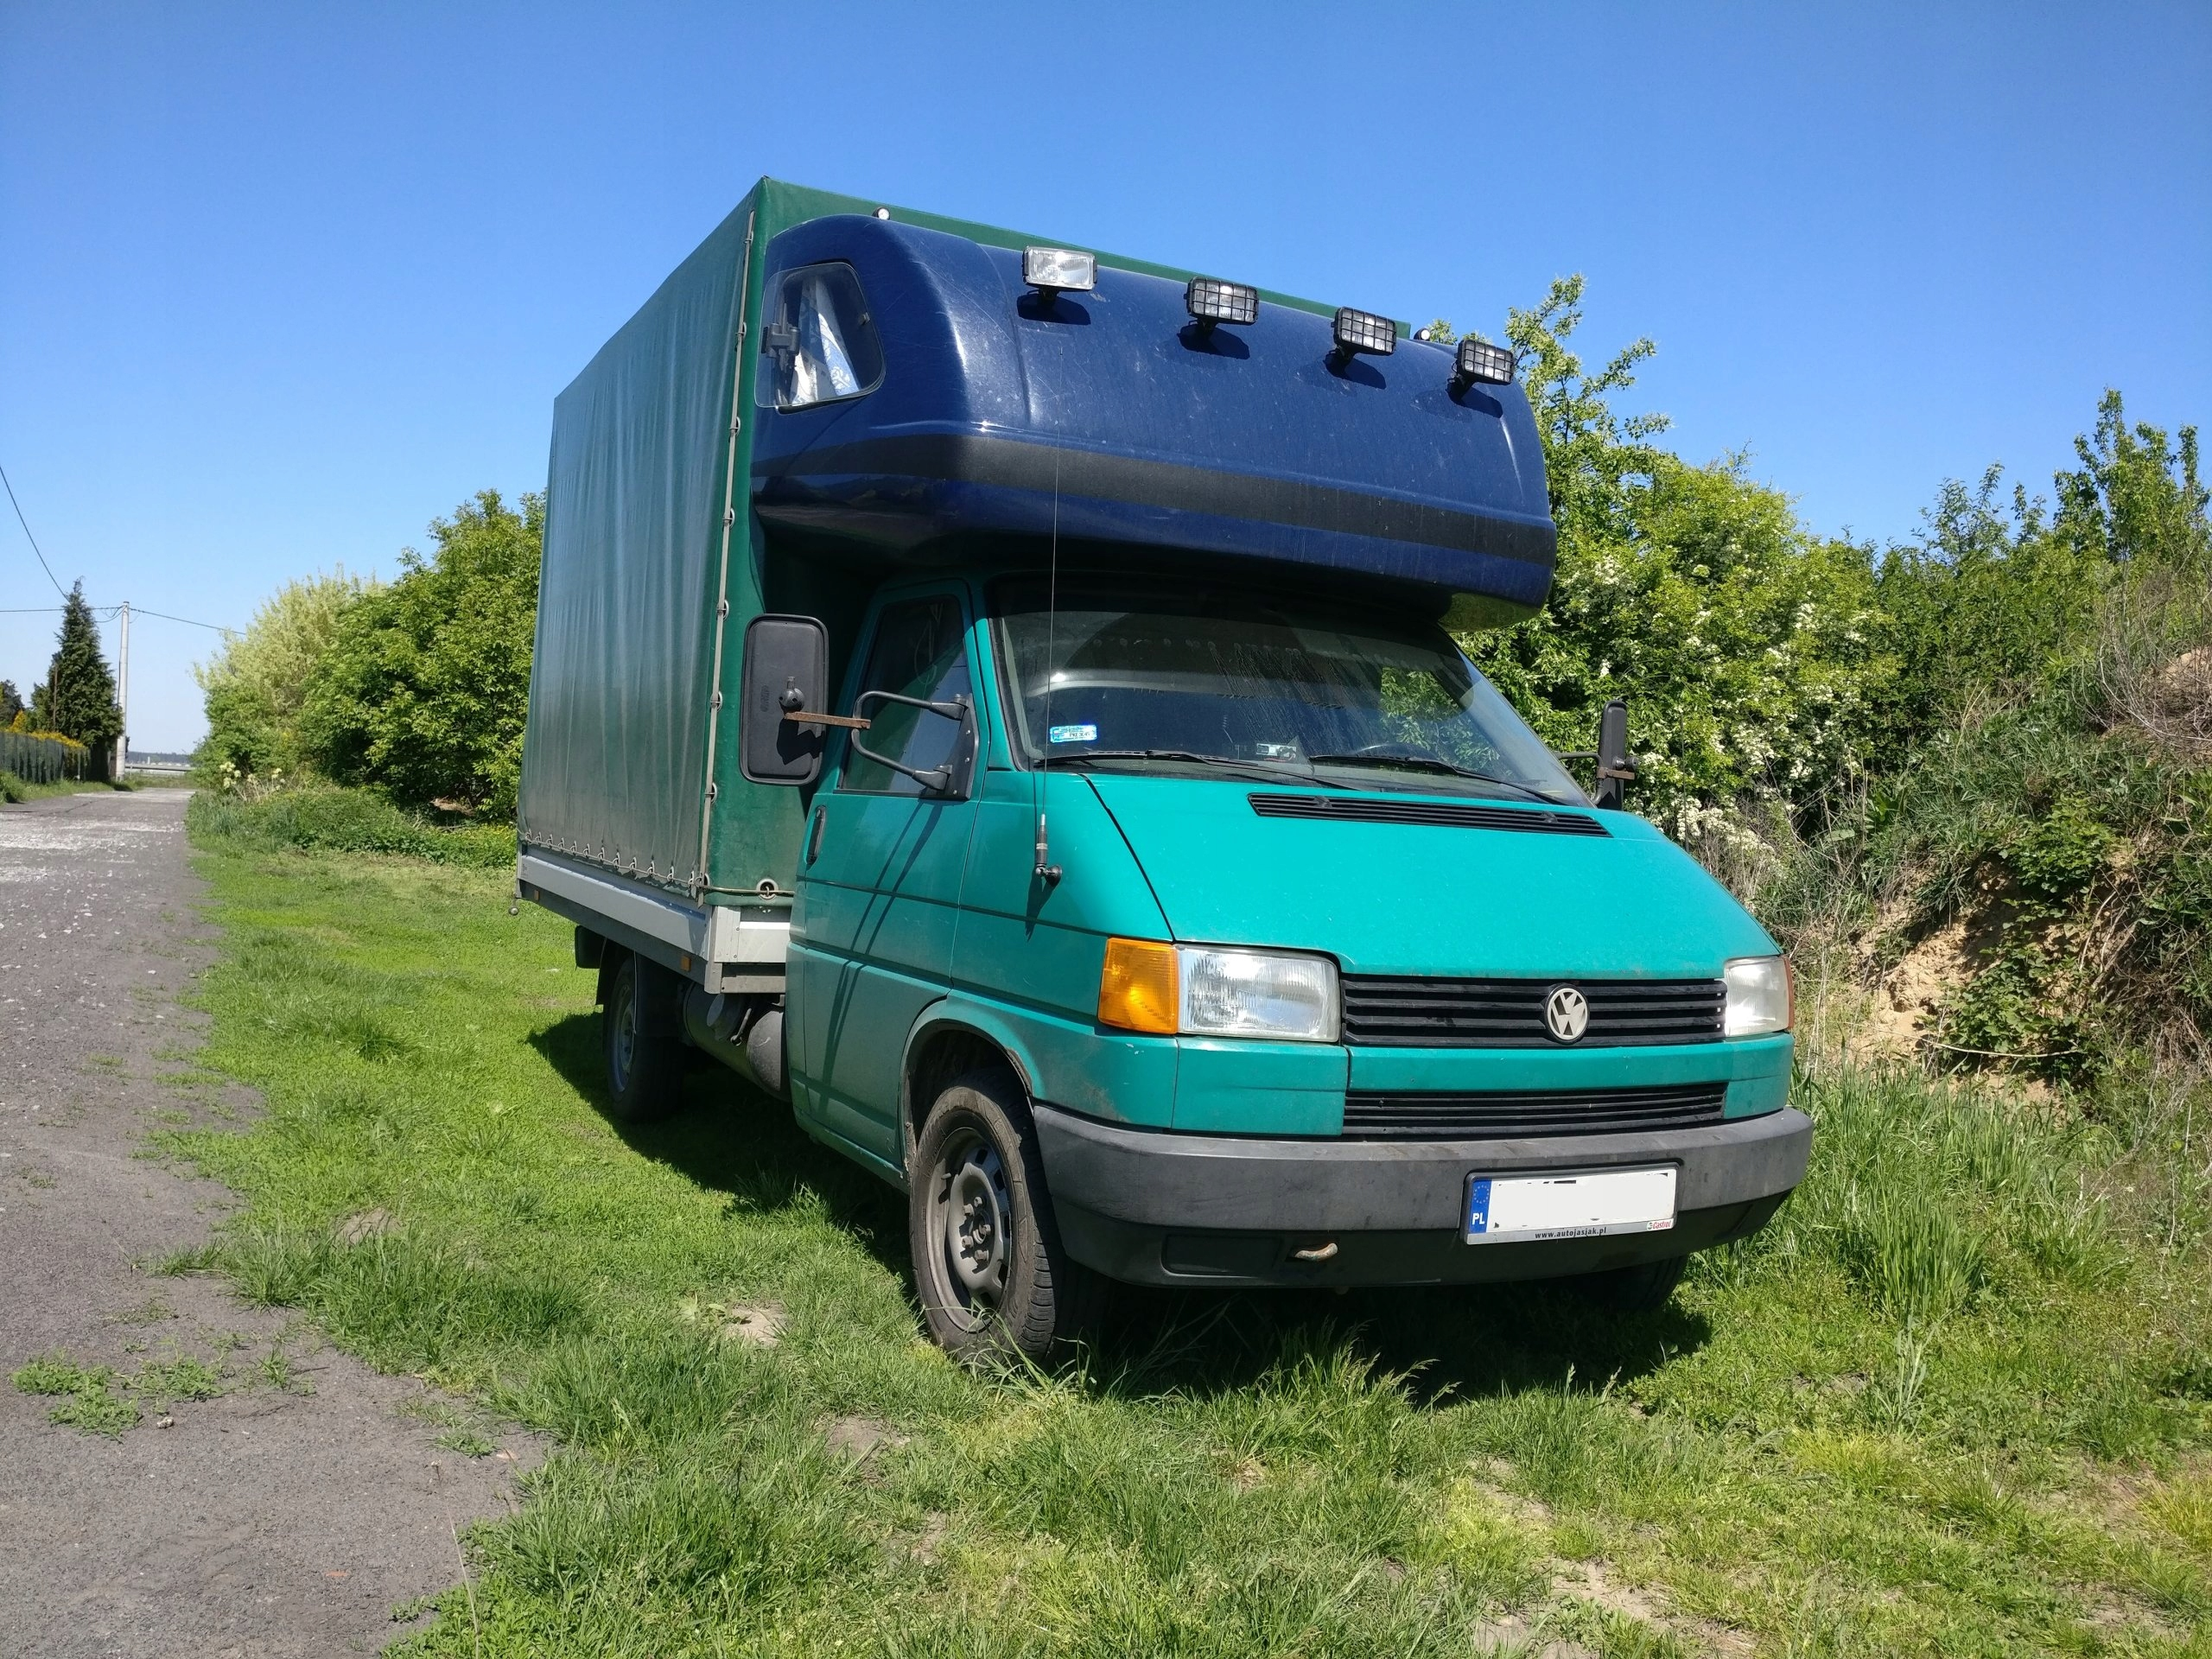 VW T4 - plandeka - benzyna + LPG, kabina wejkama!